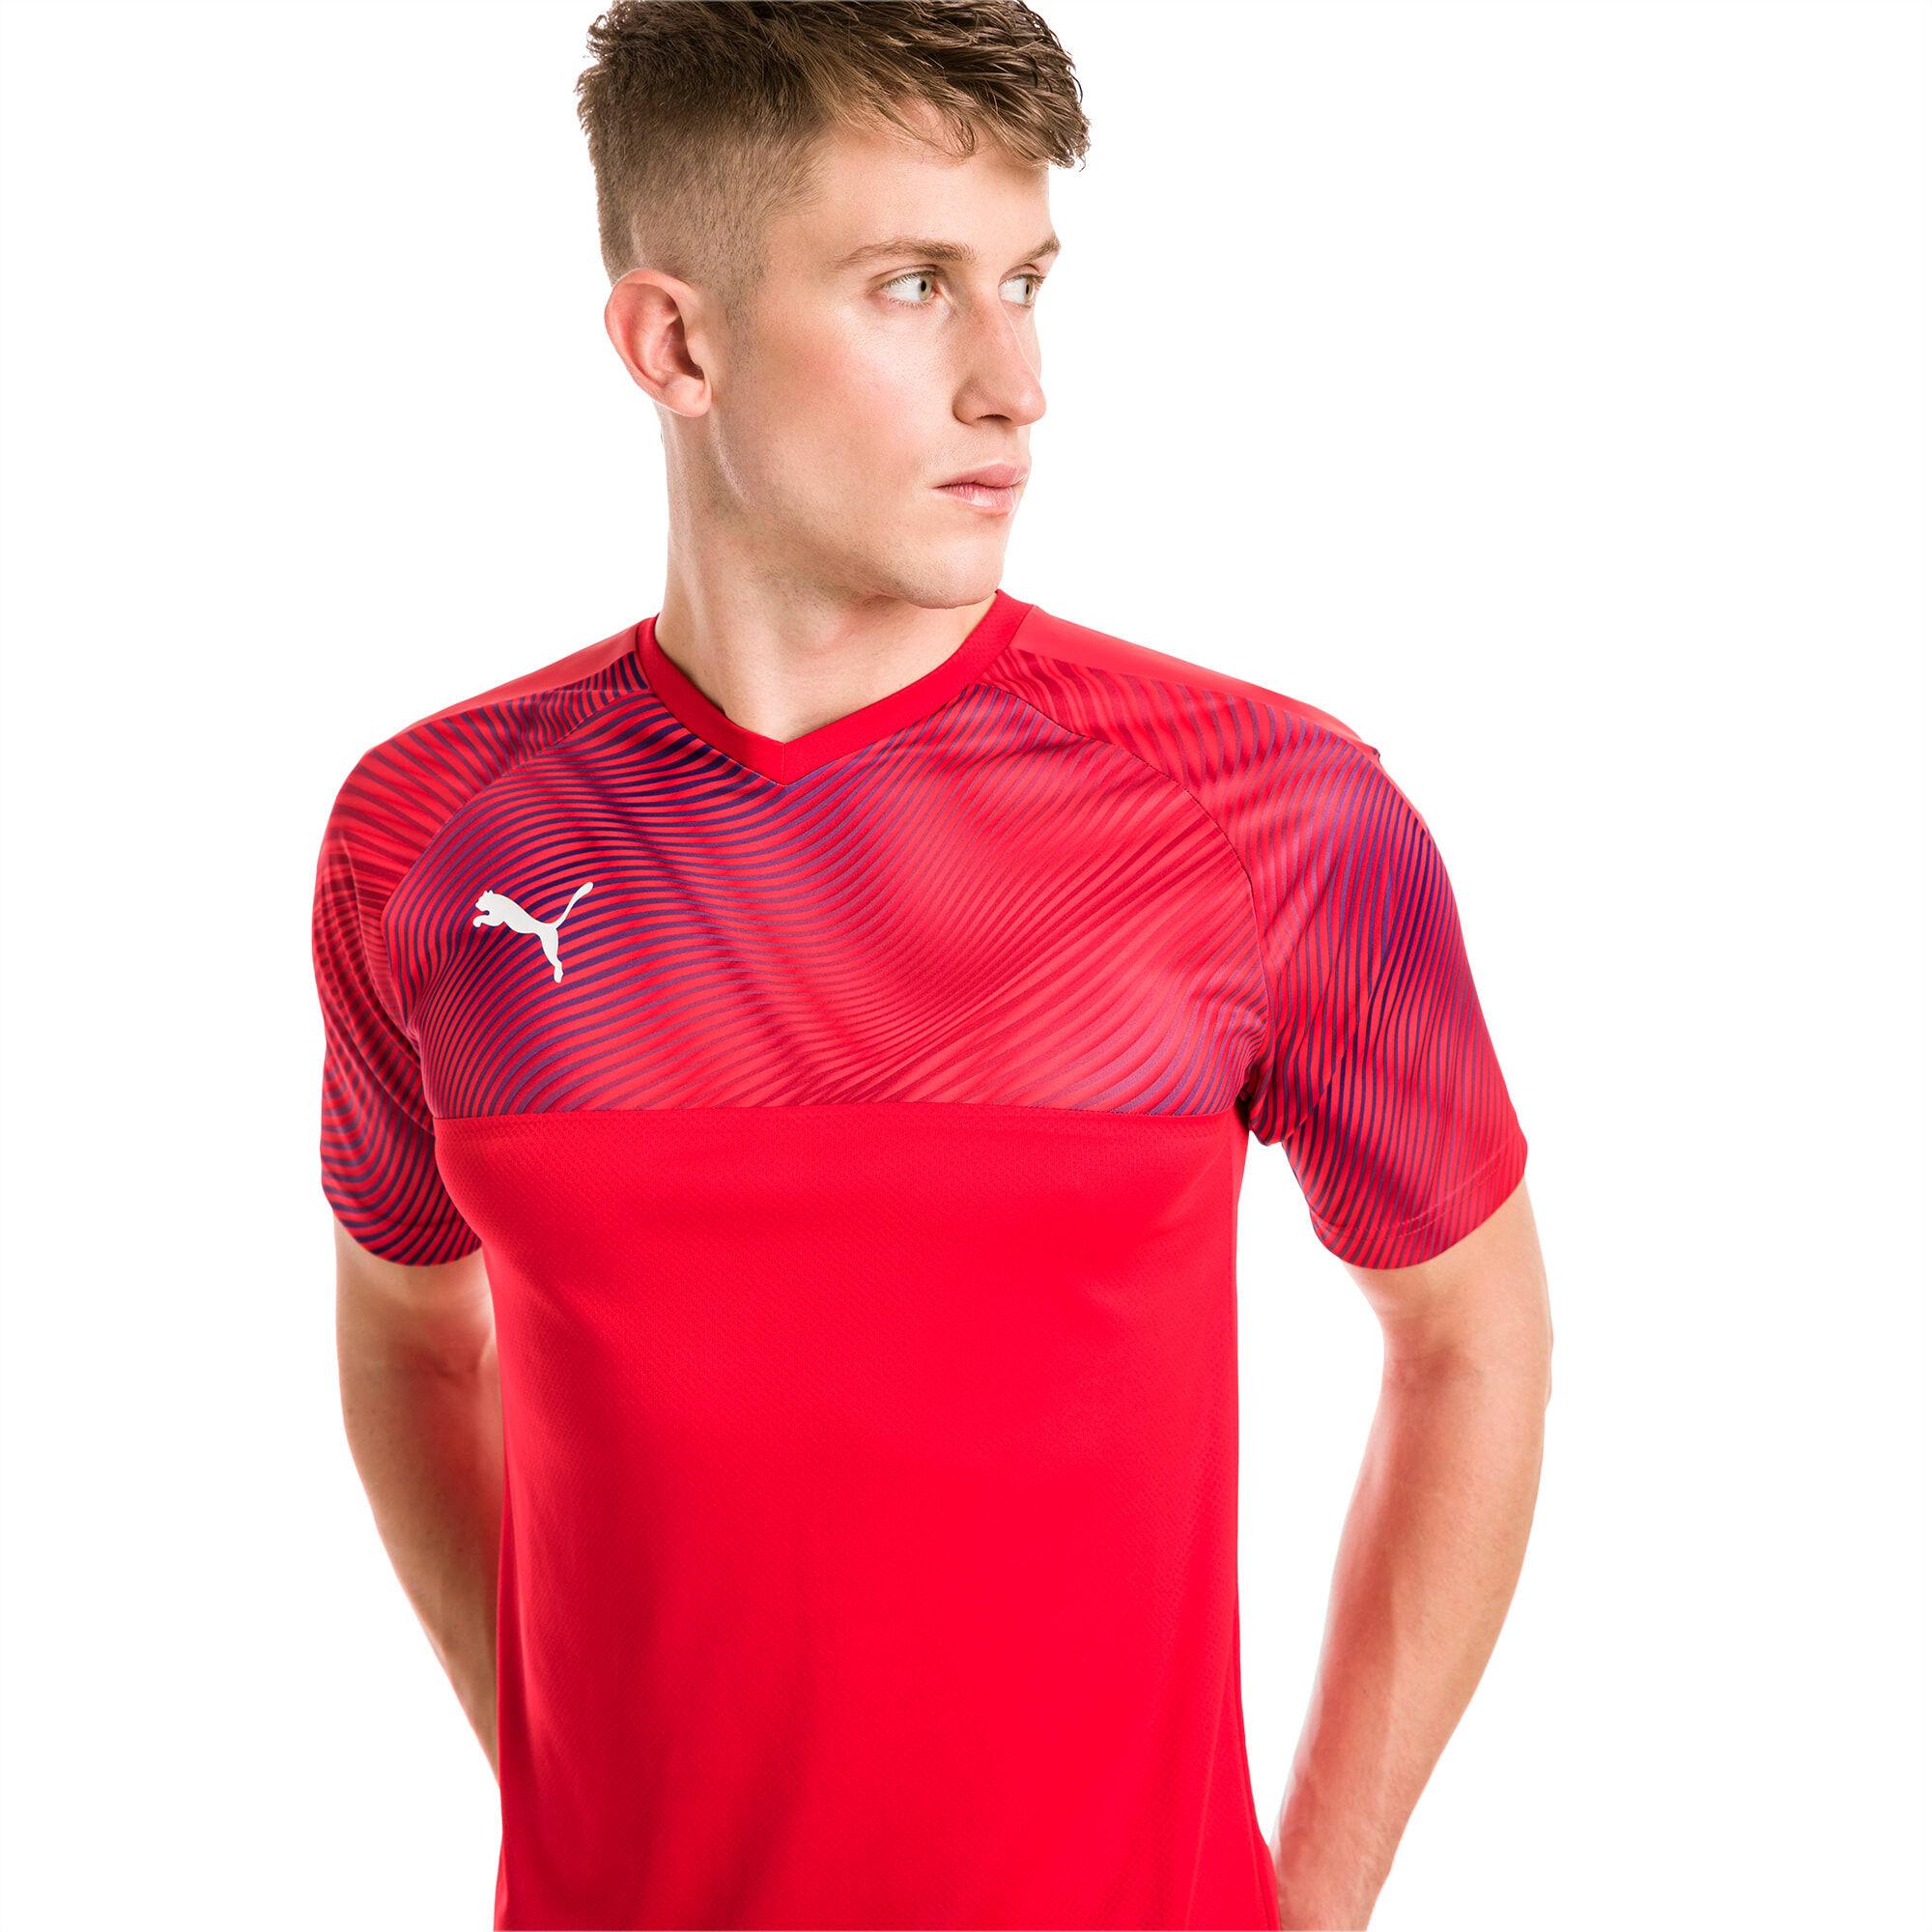 PUMA Maillot Football CUP pour Homme, Rouge/Blanc, Taille 6XL, Vêtements